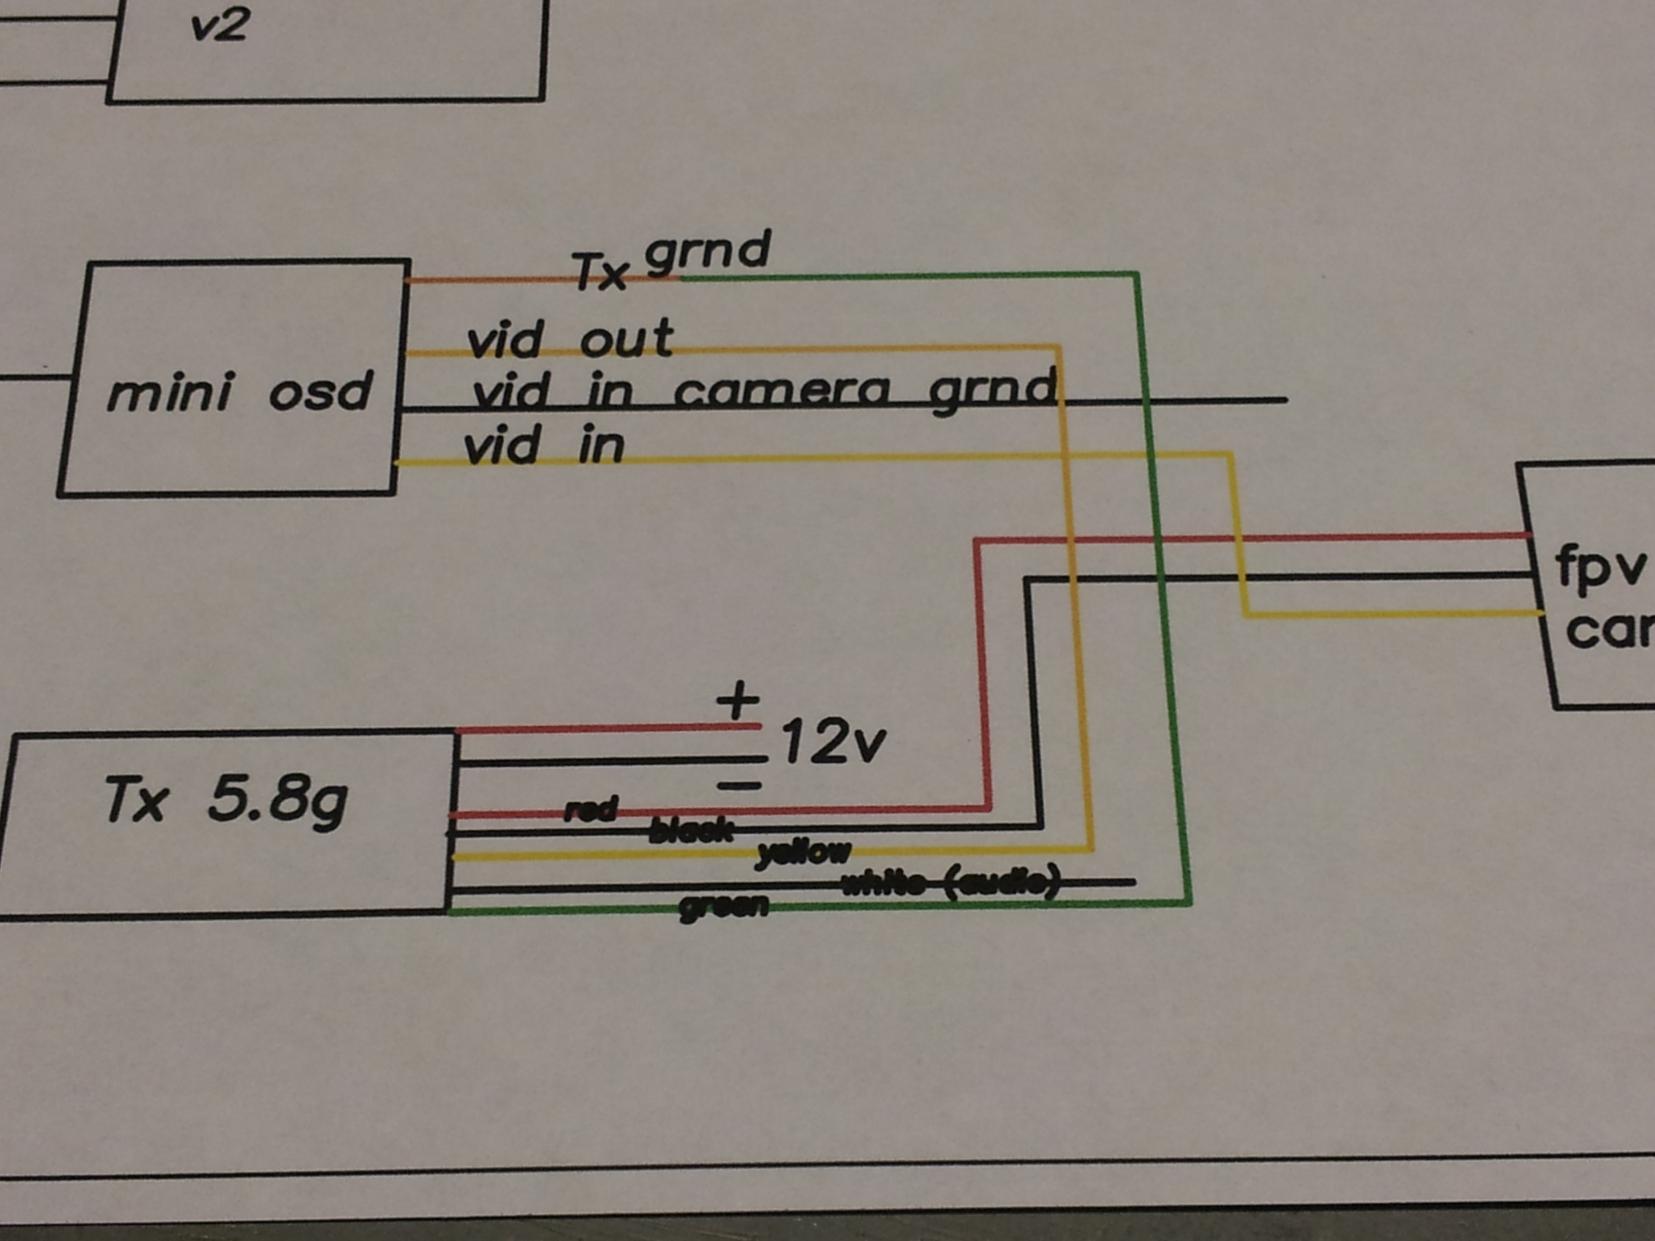 mini osd setup question dronevibes drones, uav's, multirotor iosd mini wiring diagram at virtualis.co